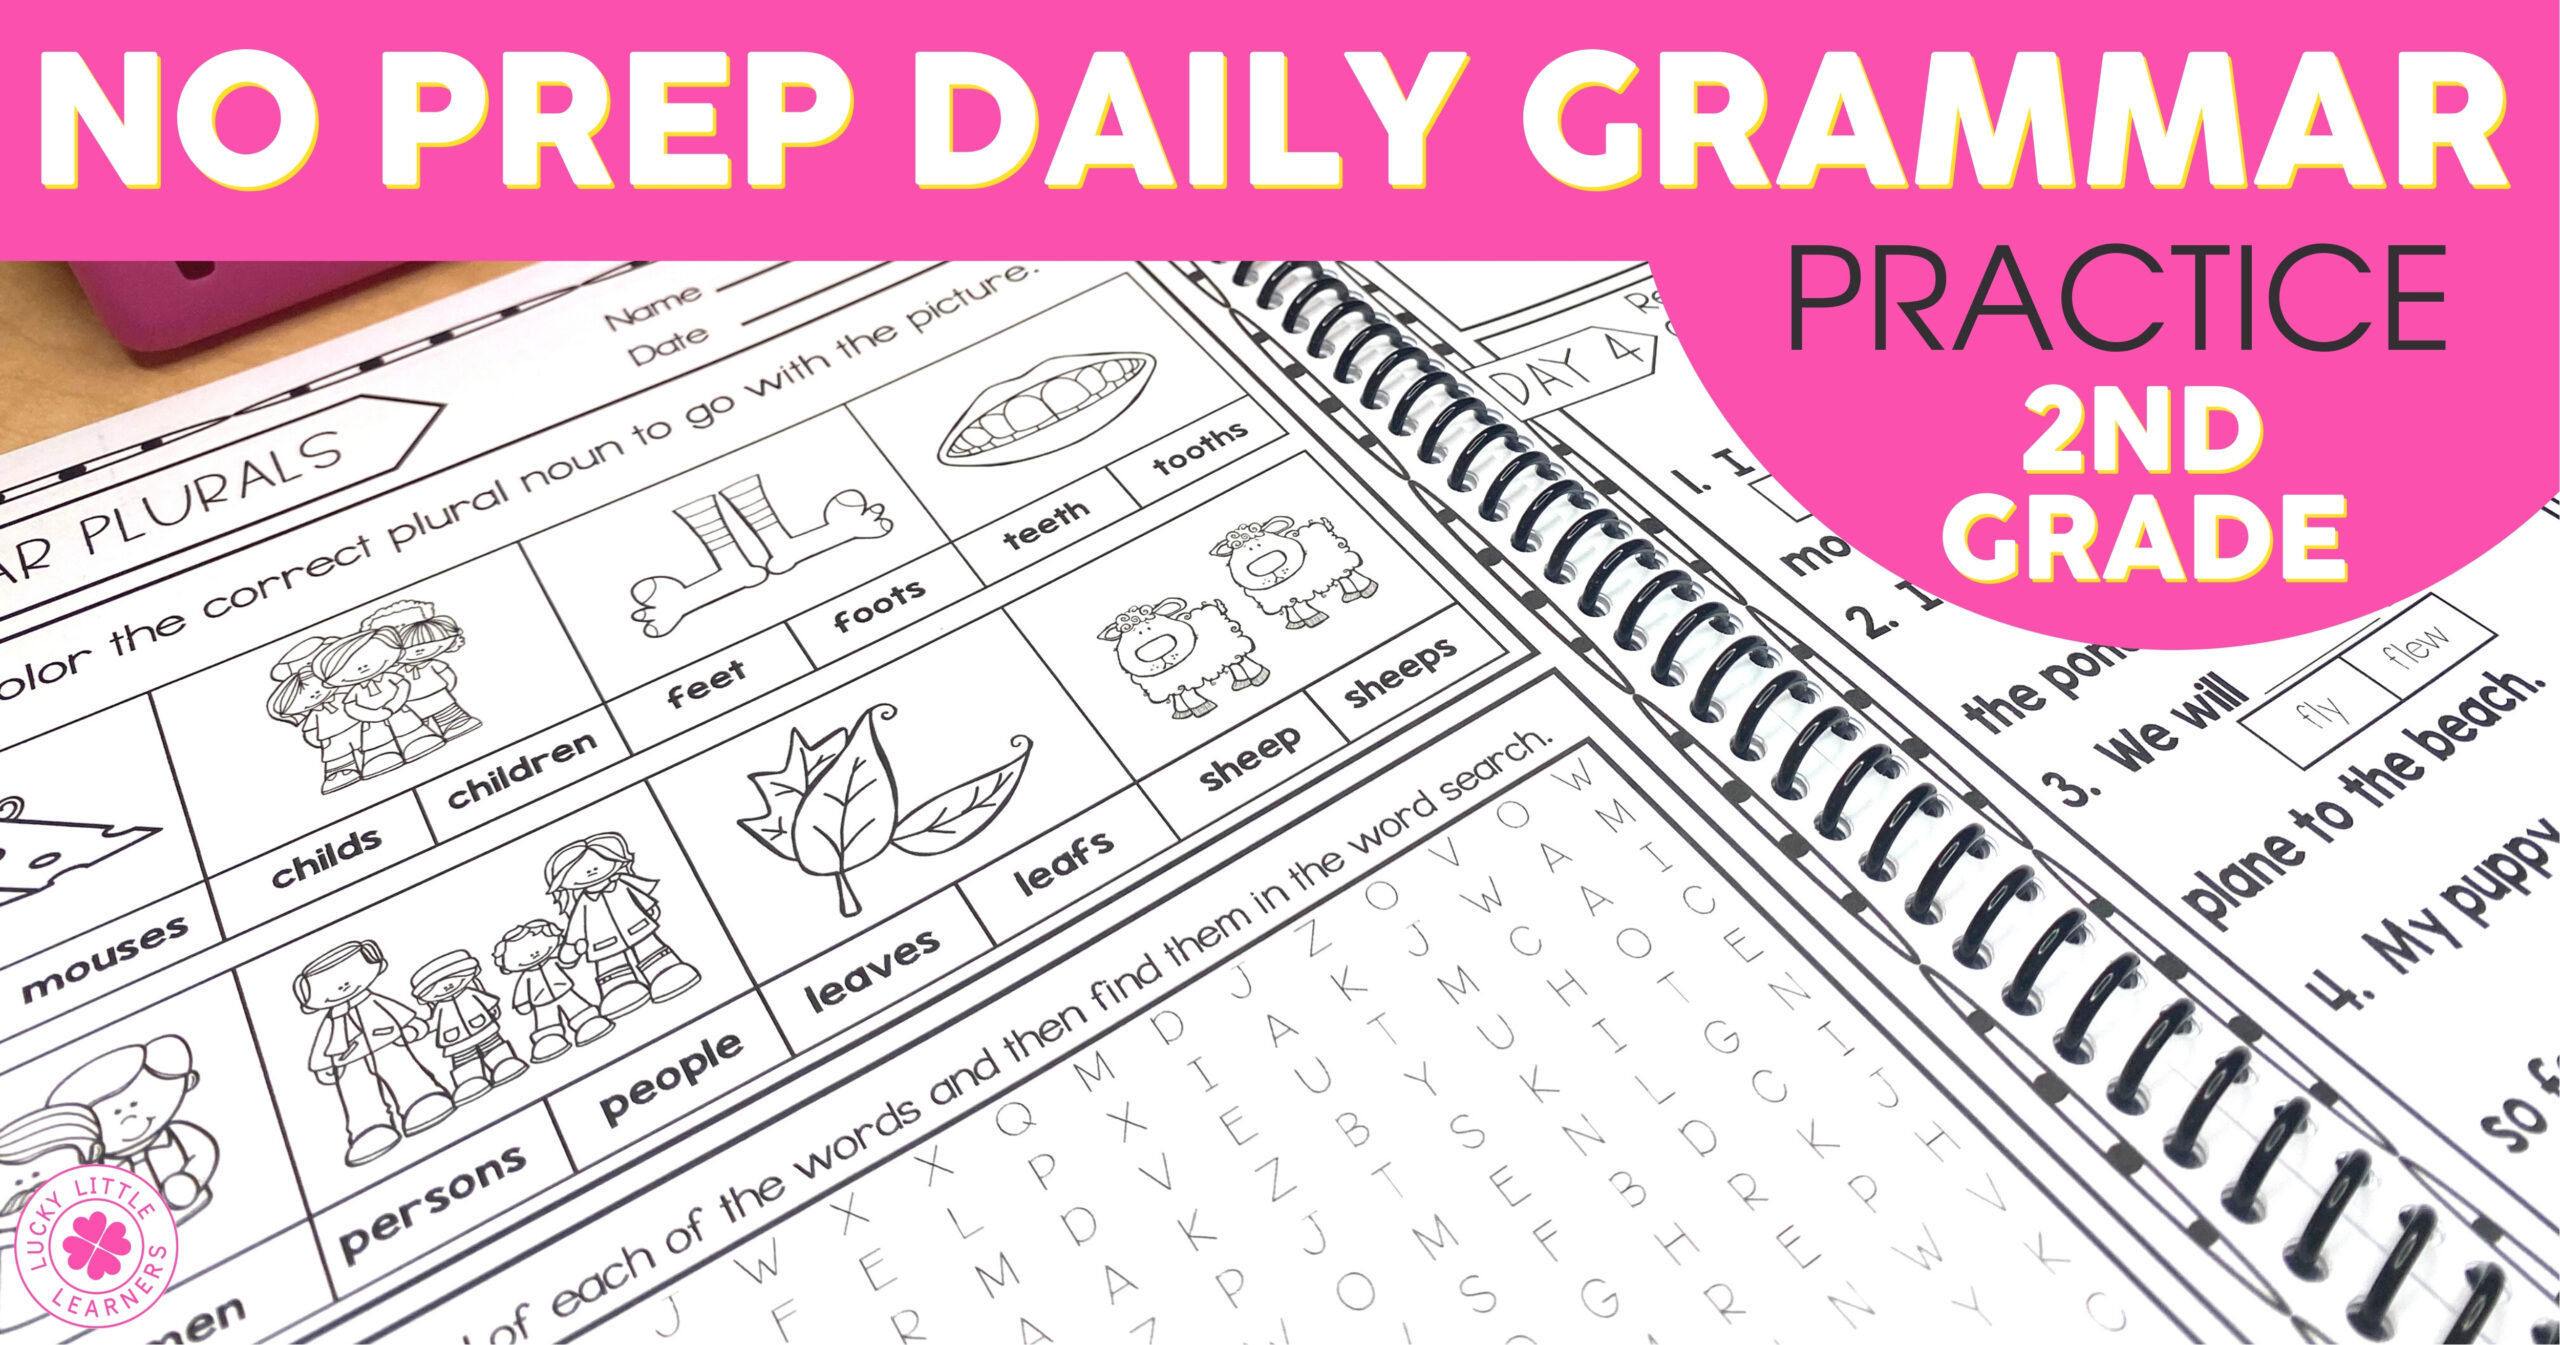 No Prep Daily Grammar Practice in 2nd Grade